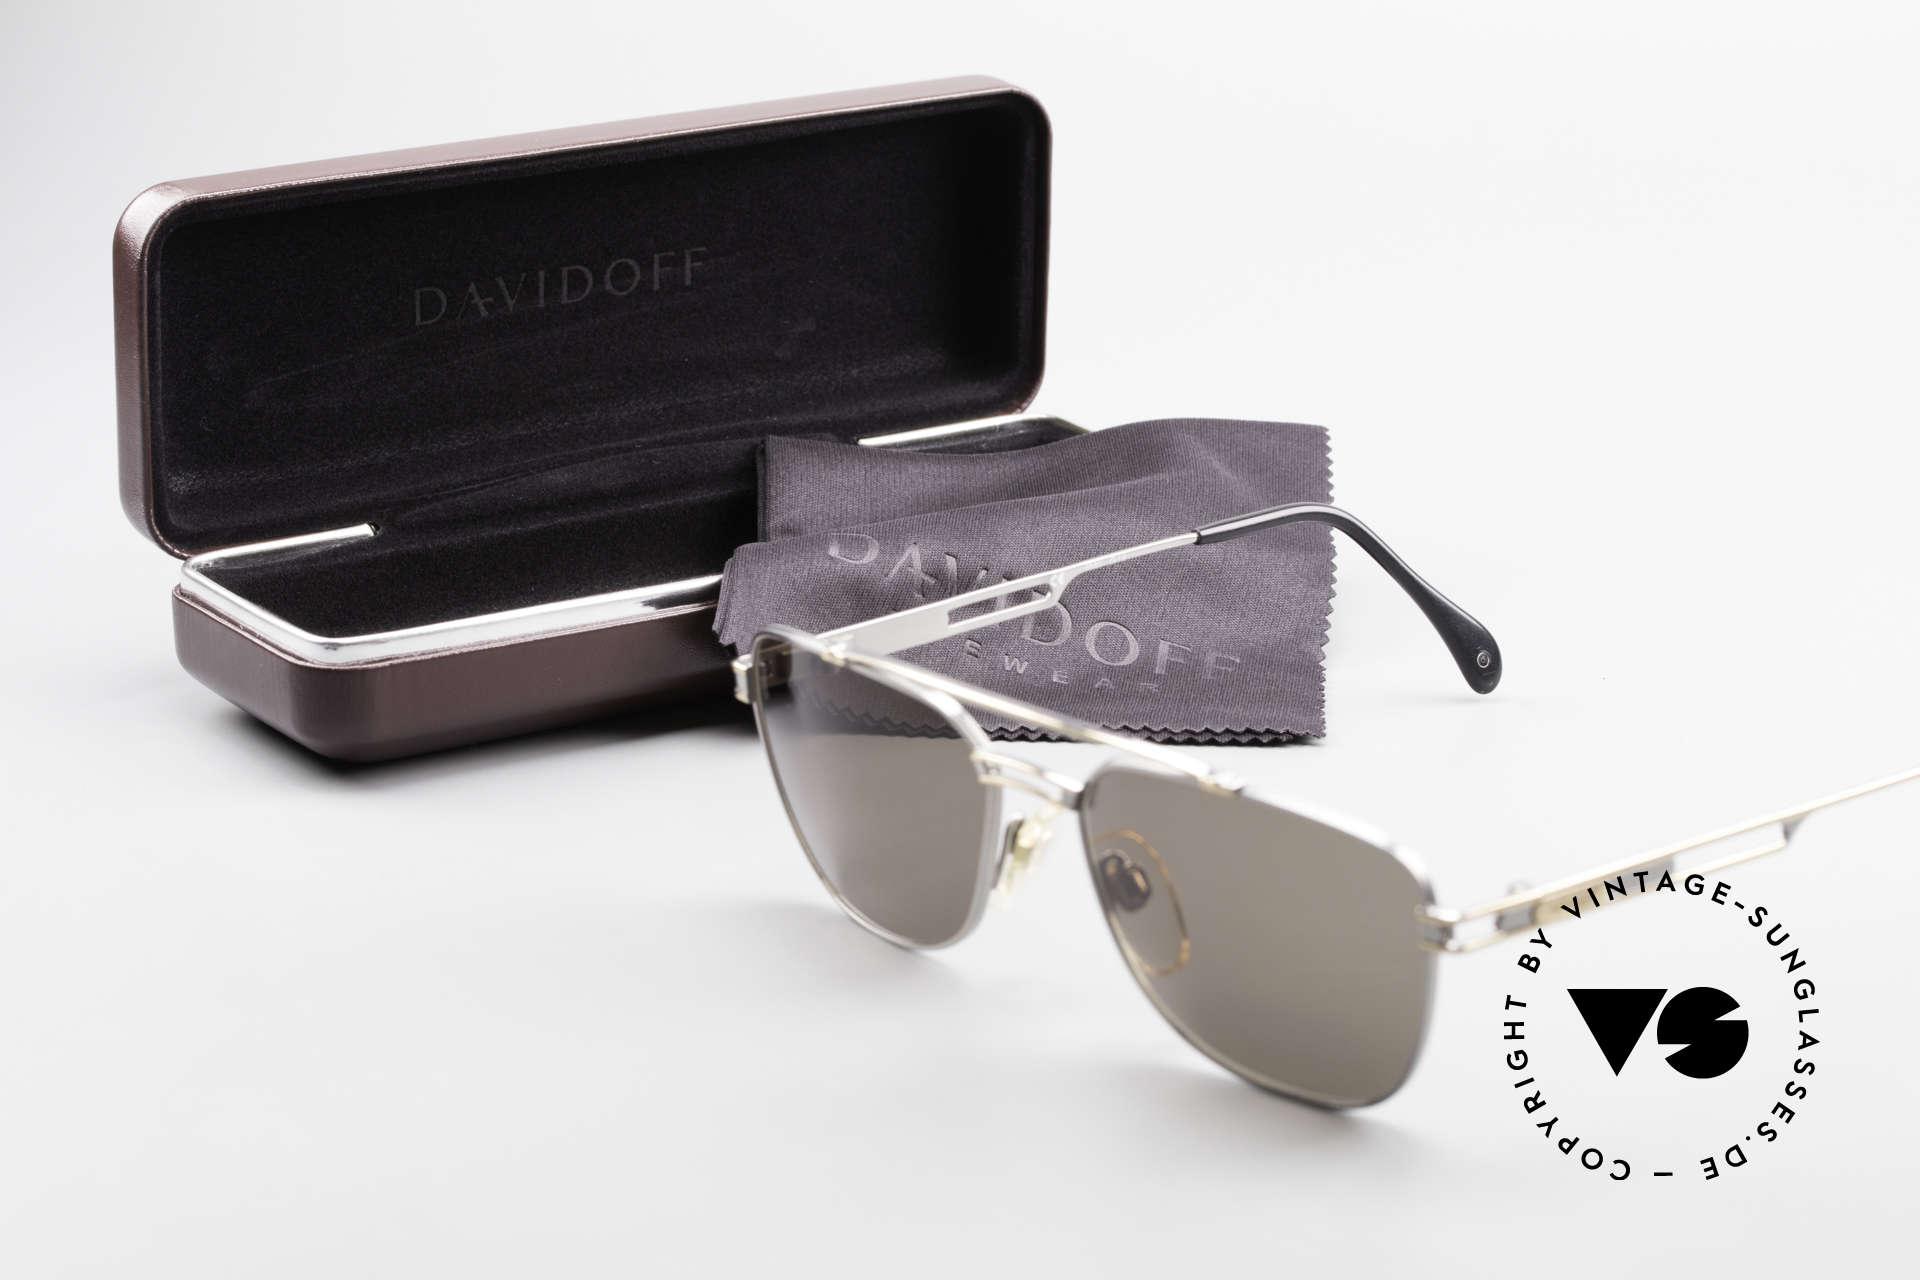 Davidoff 708 Classic Men's Sunglasses, Size: medium, Made for Men